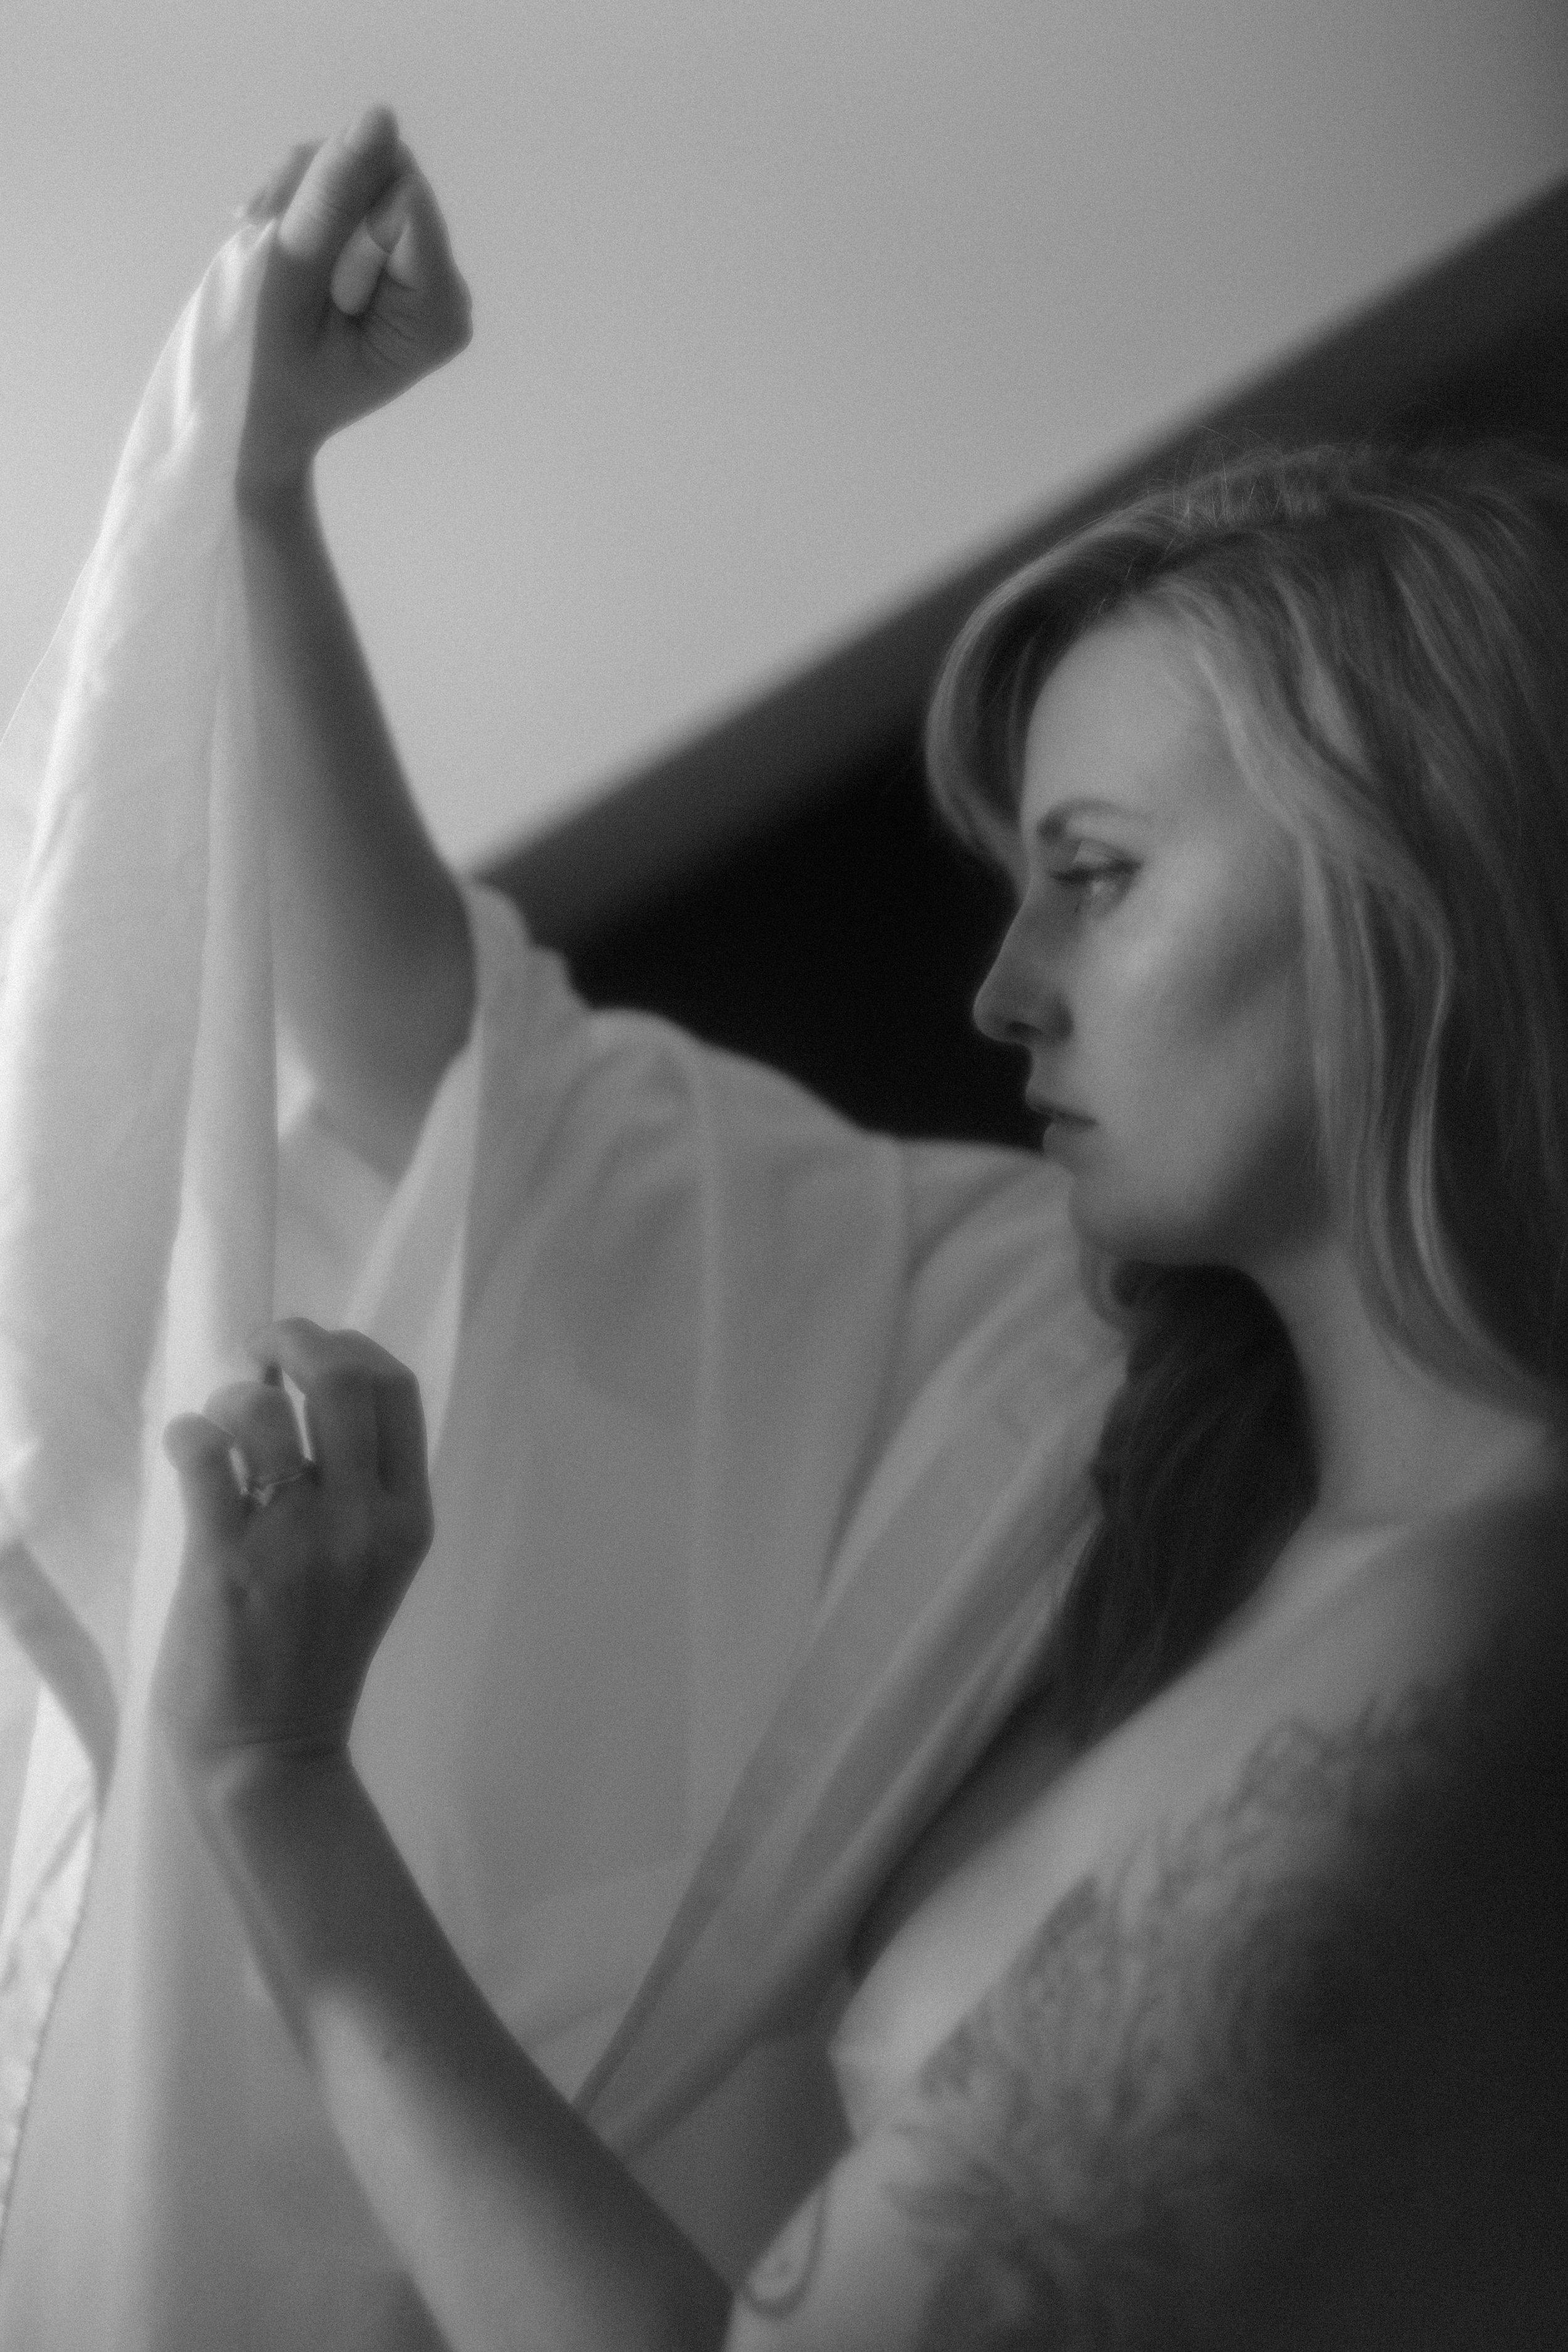 editorial portrait photography. sarah rose photography. ohio portrait photographer. hazy portrait photography